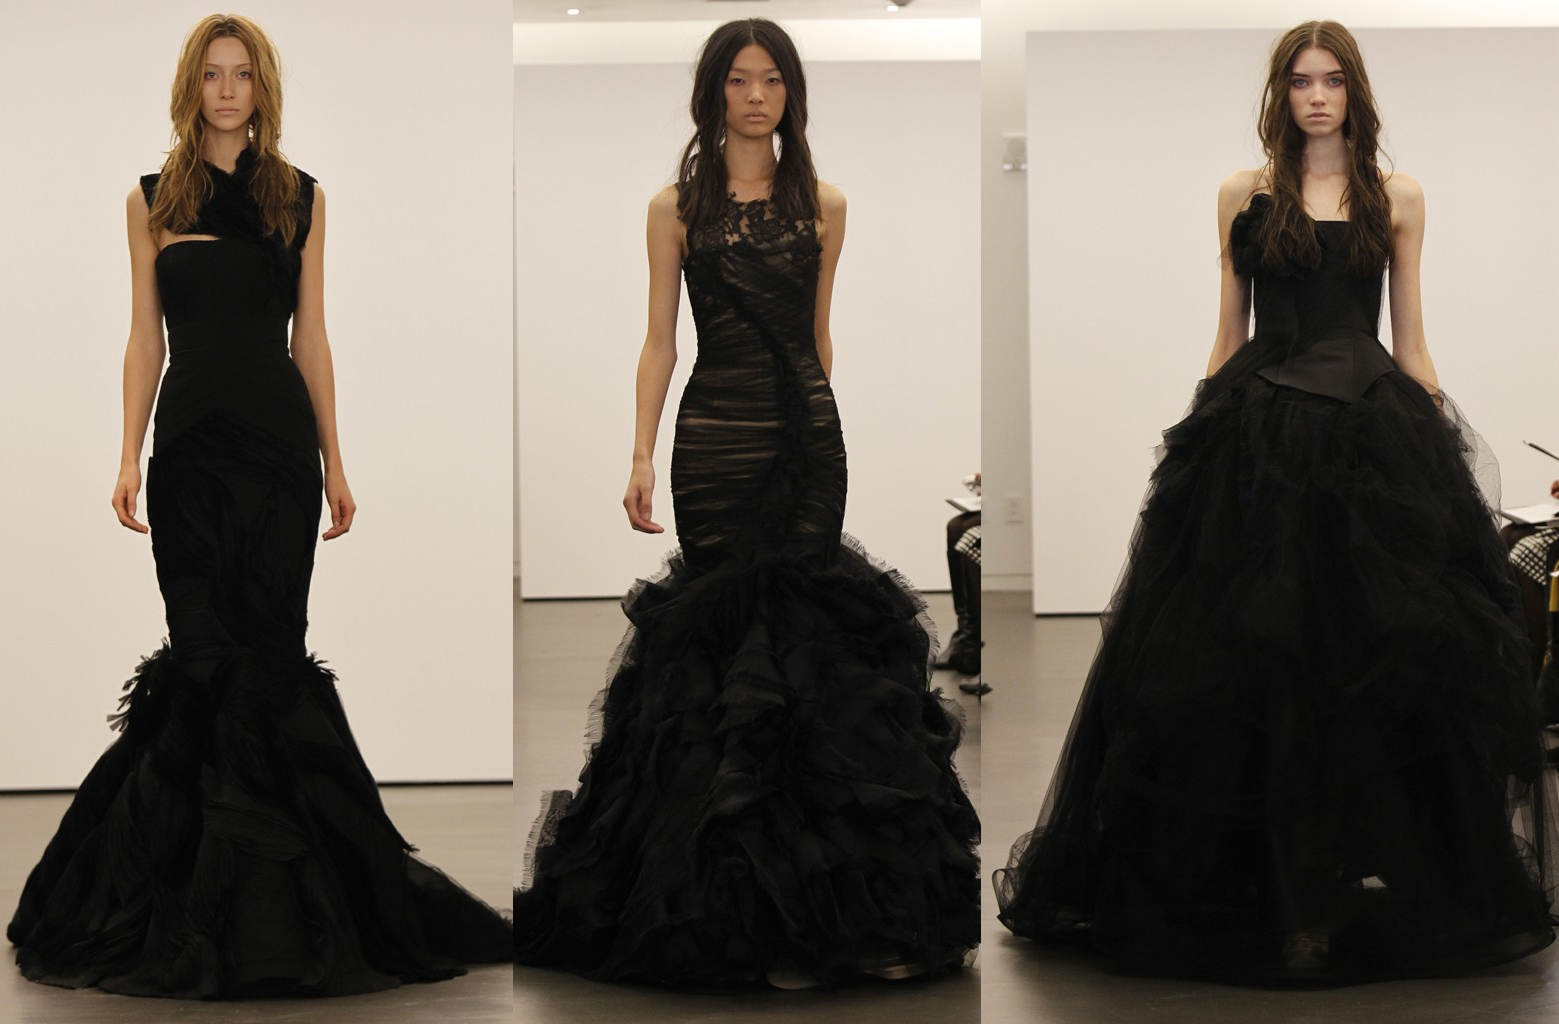 Black Wedding Gowns: No More White Wedding Dresses At Vera Wang